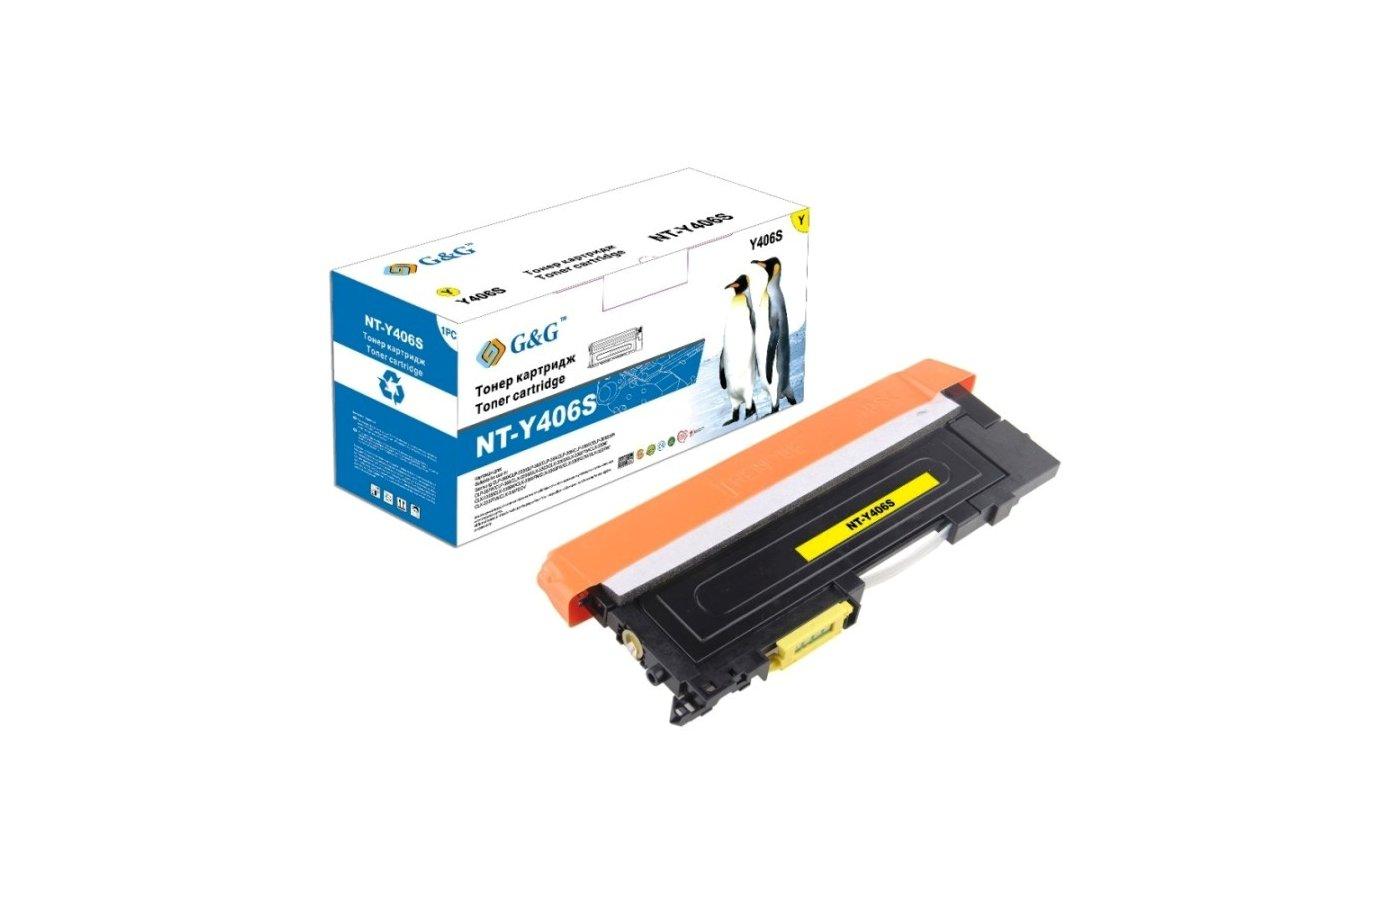 Картридж лазерный GG NT-Y406S Совместимый желтый для Samsung для CLP-360/365 CLX-3300/3305 SL-C460 (1000стр)